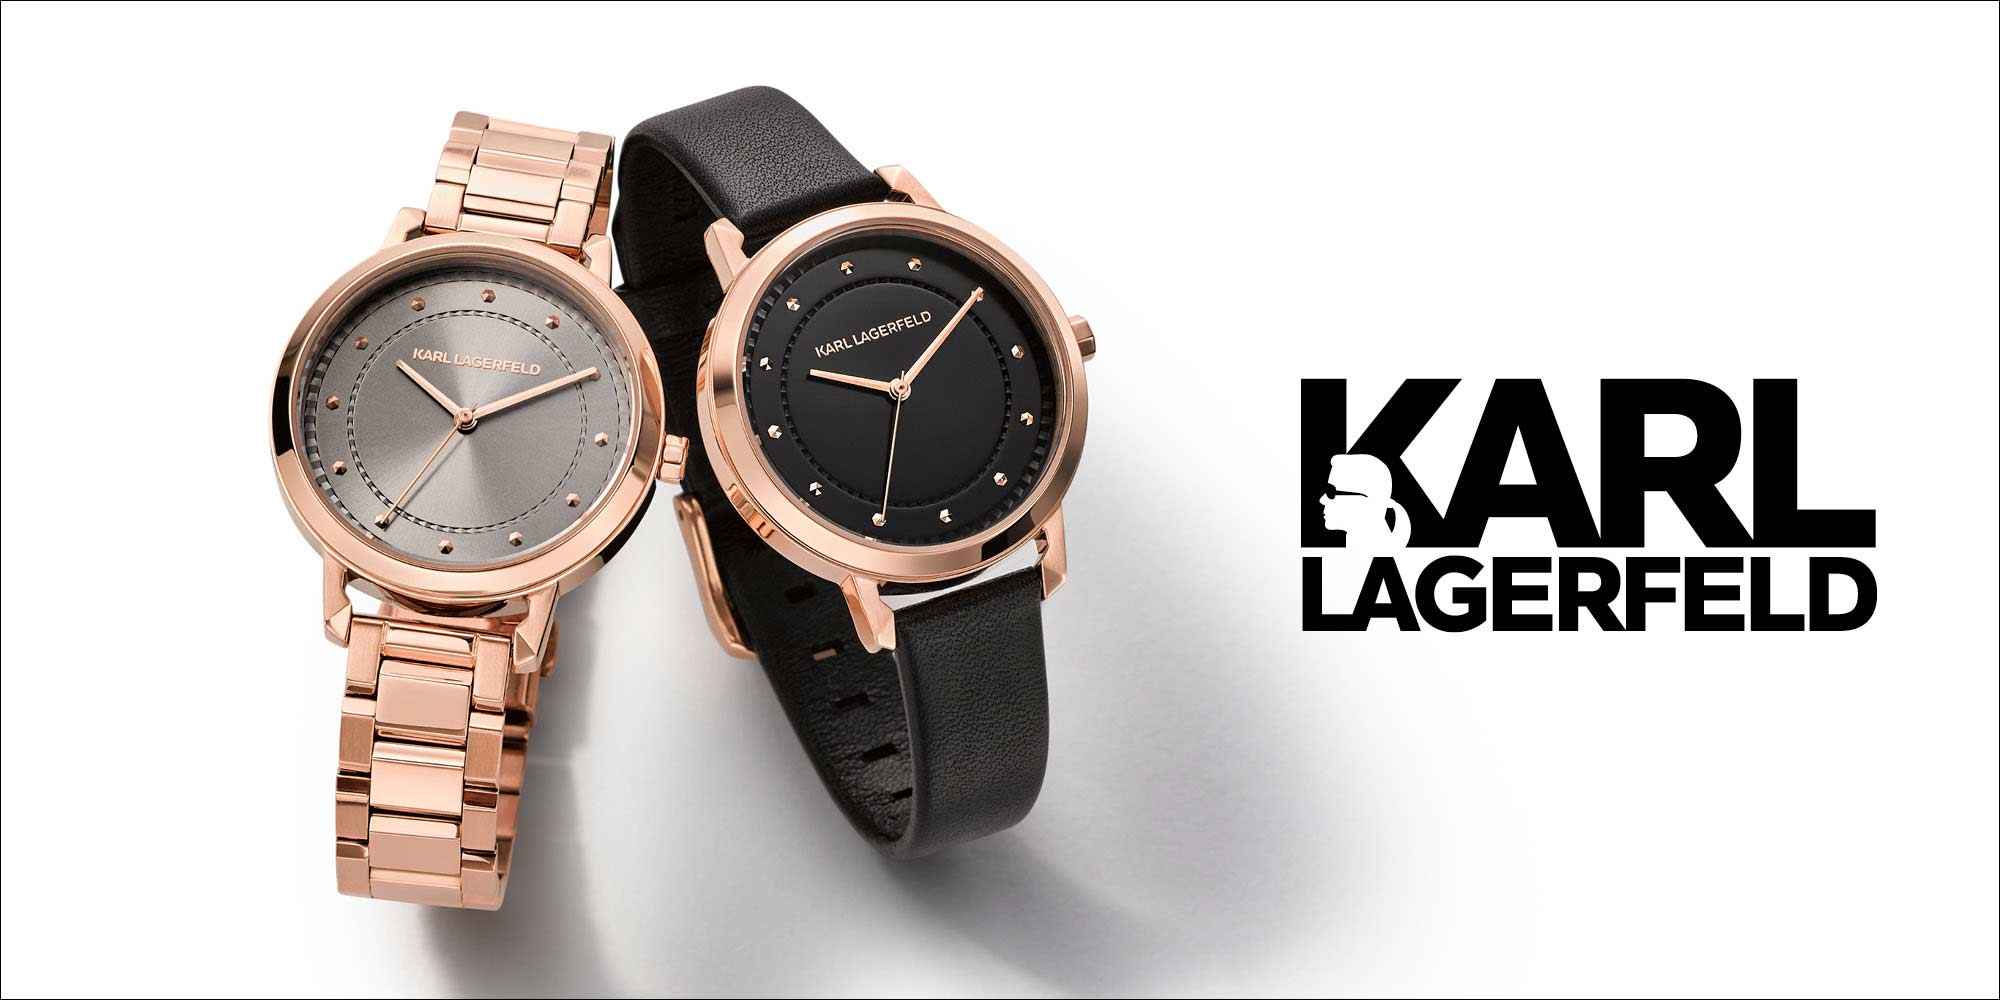 karl lagerfeld sur bijourama le n 1 des bijoux et montres. Black Bedroom Furniture Sets. Home Design Ideas